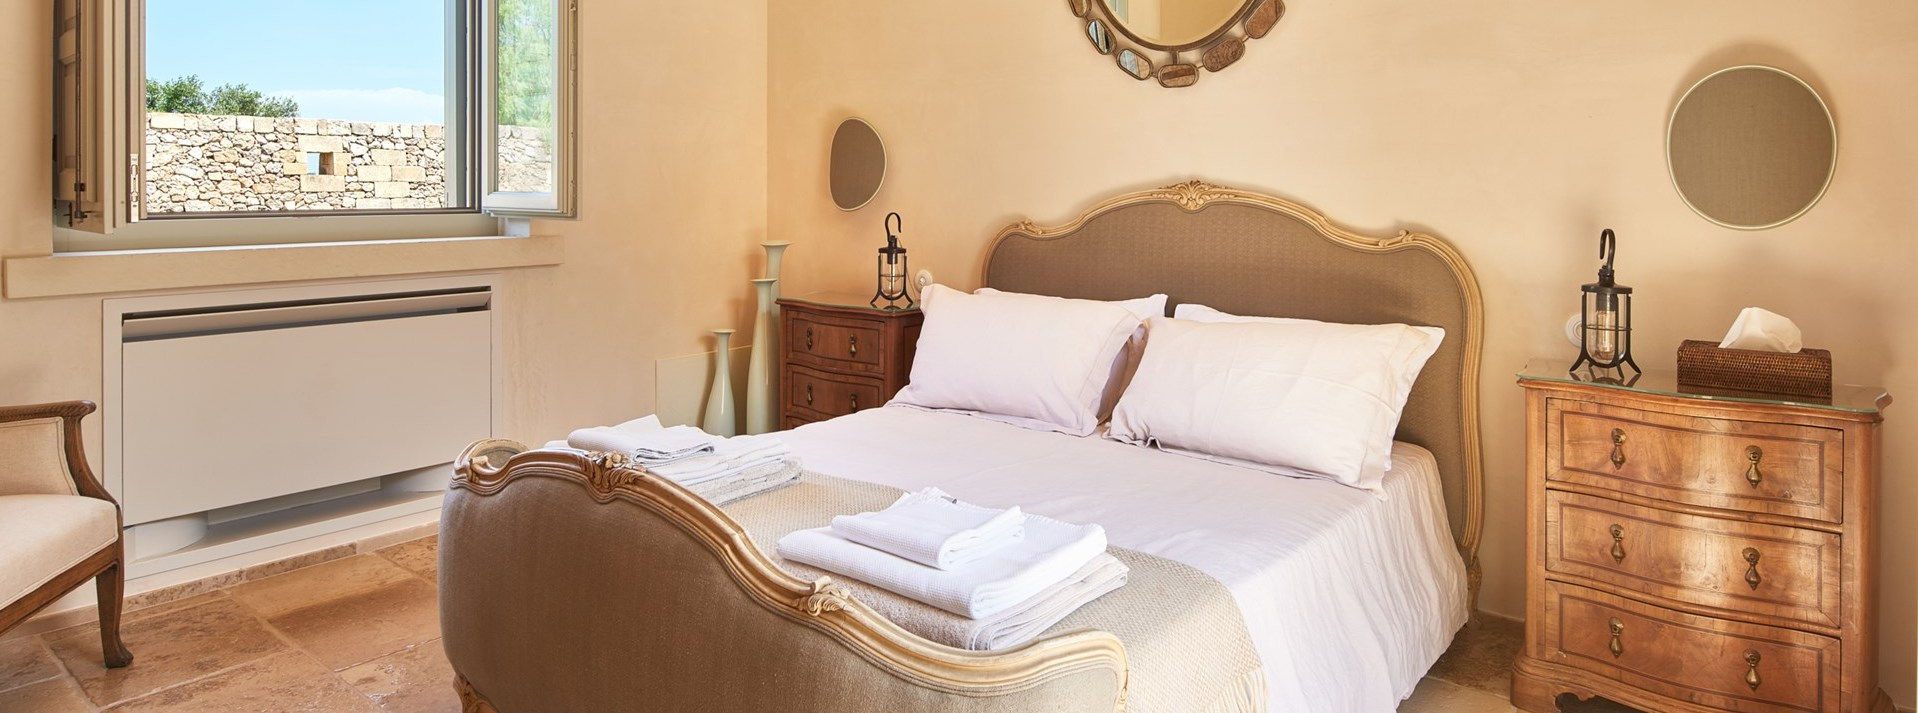 luxury-5-bed-villa-puglia-bedroom